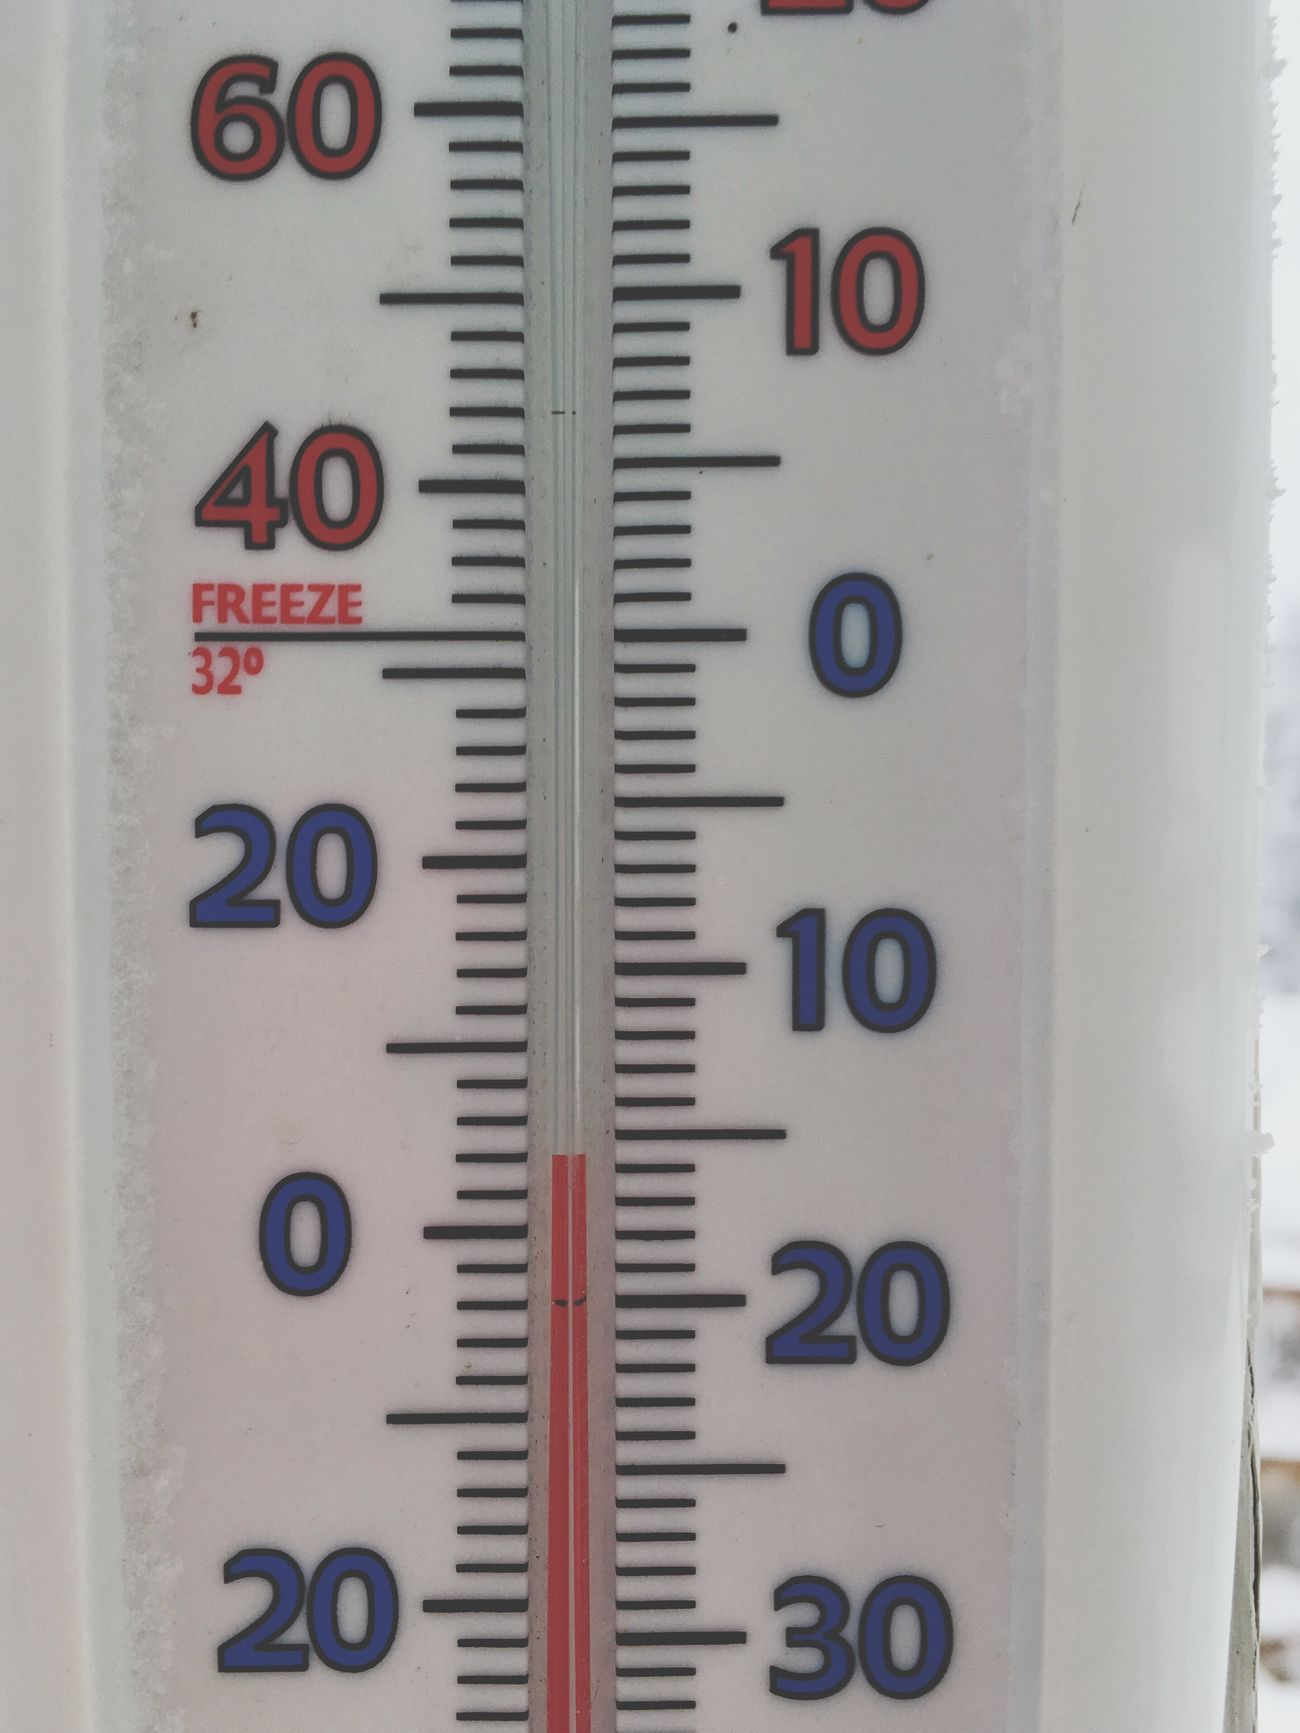 2 Jan 2017❄️ 💃🏻------------------ Thermometer Temperature Day ----------- EyeEm Tadda Streamzoo EyeEm Gallery StreamzooVille Tadda Community Eye4photography  Streamzoofamily